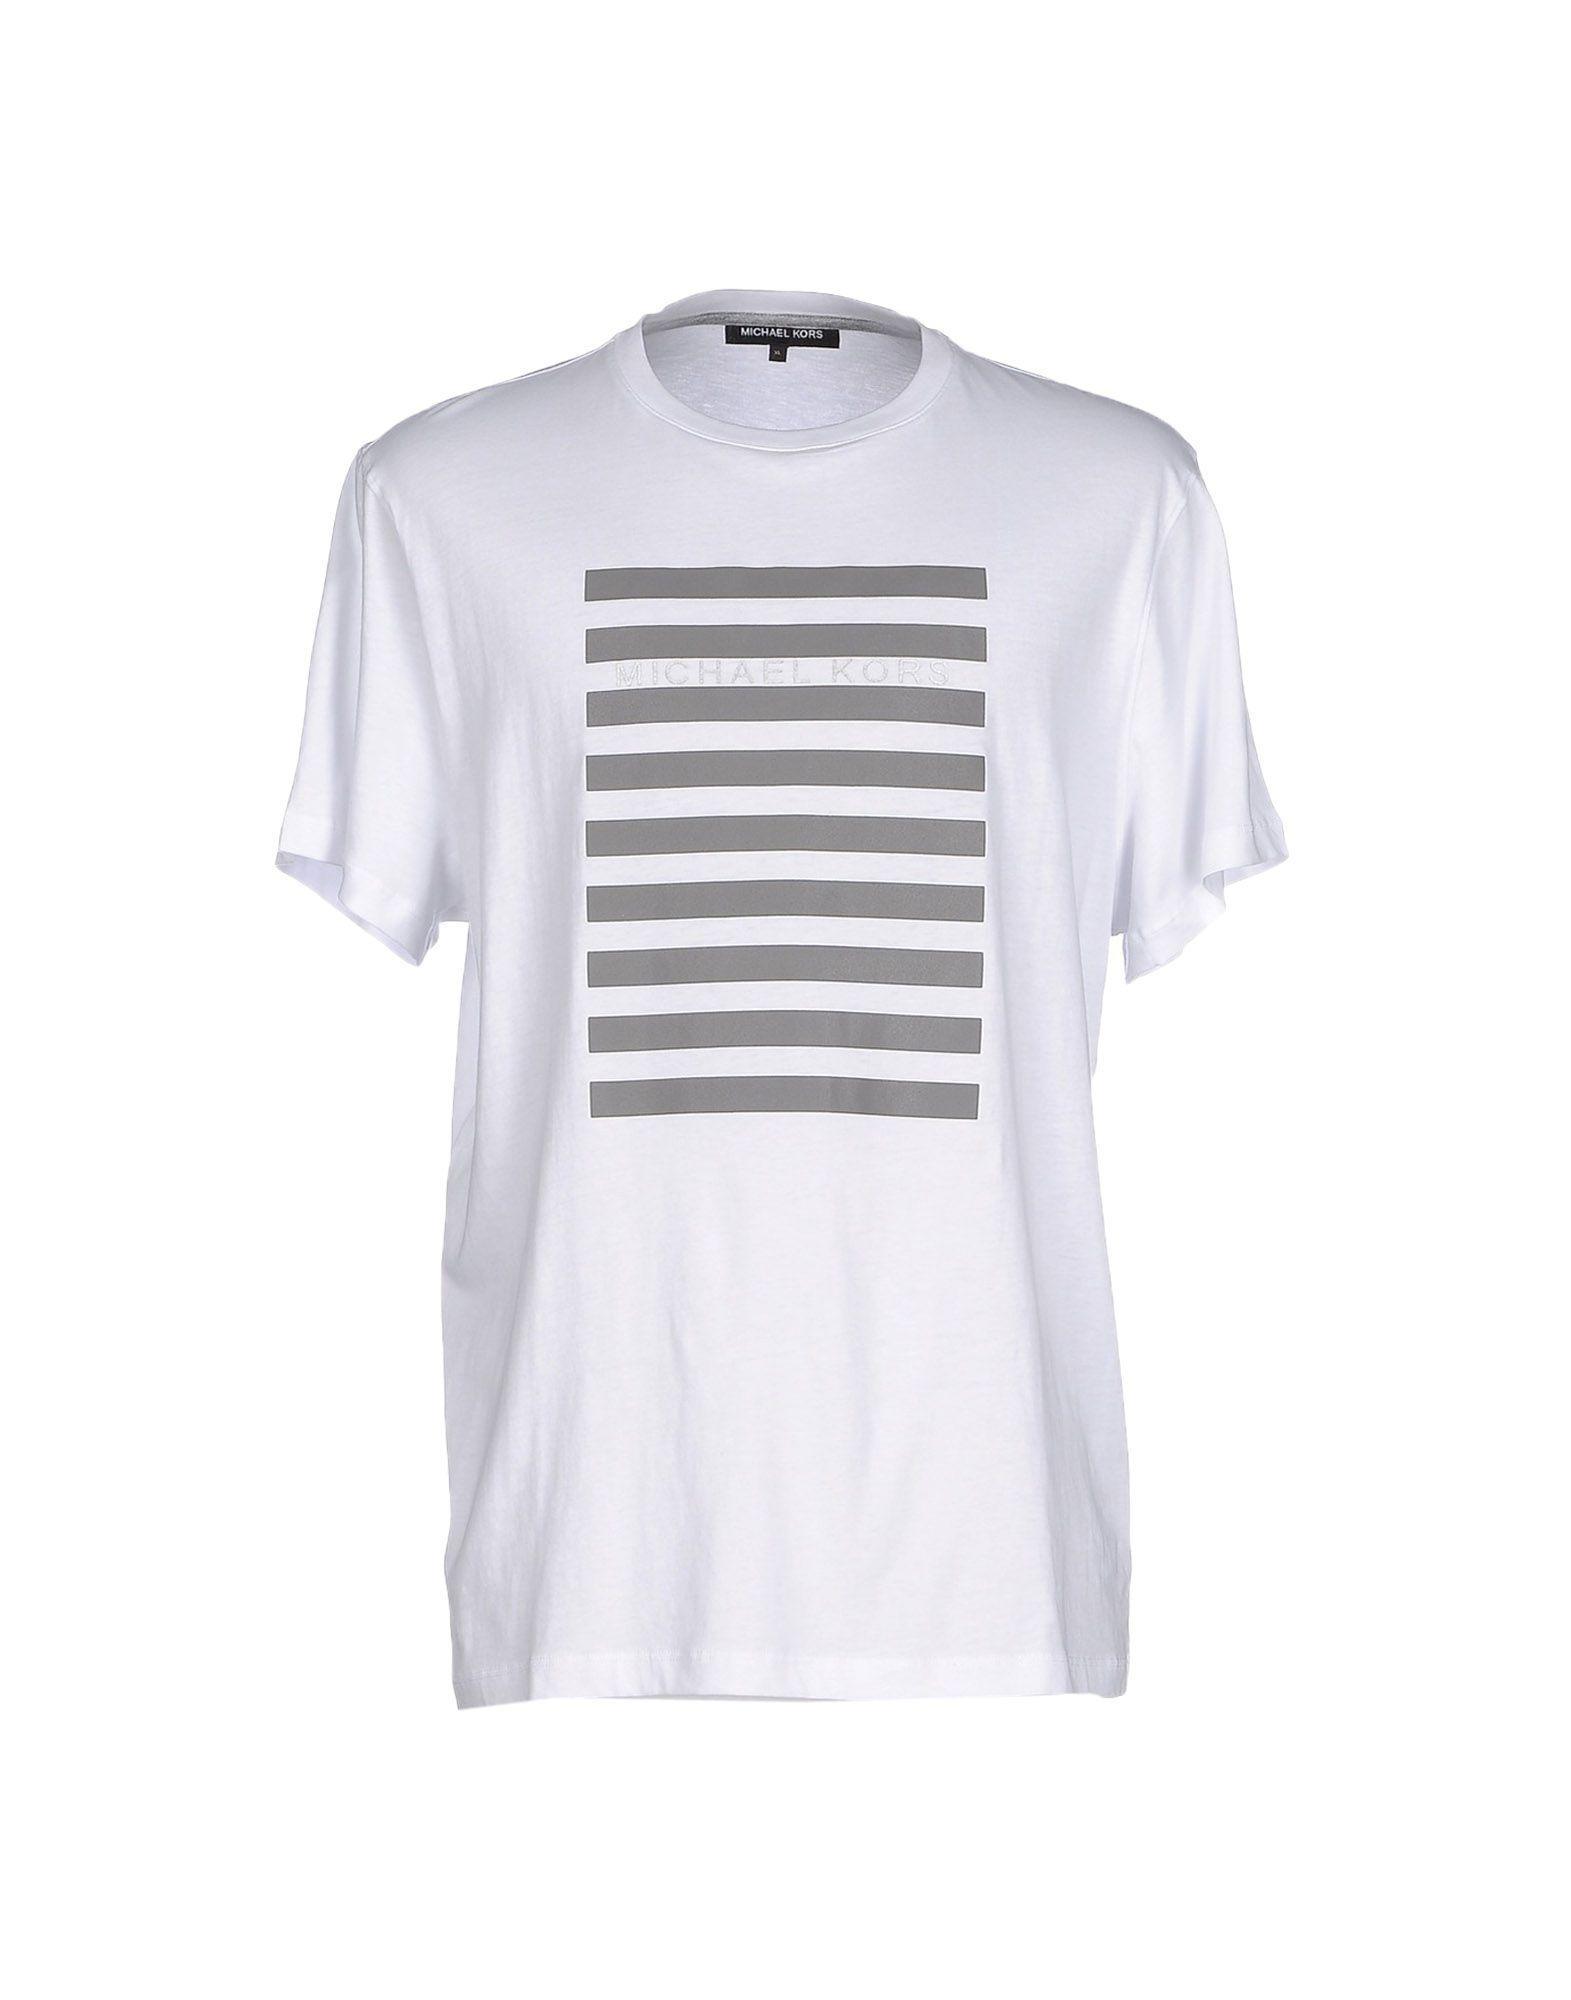 michael kors t shirt in white for men lyst. Black Bedroom Furniture Sets. Home Design Ideas